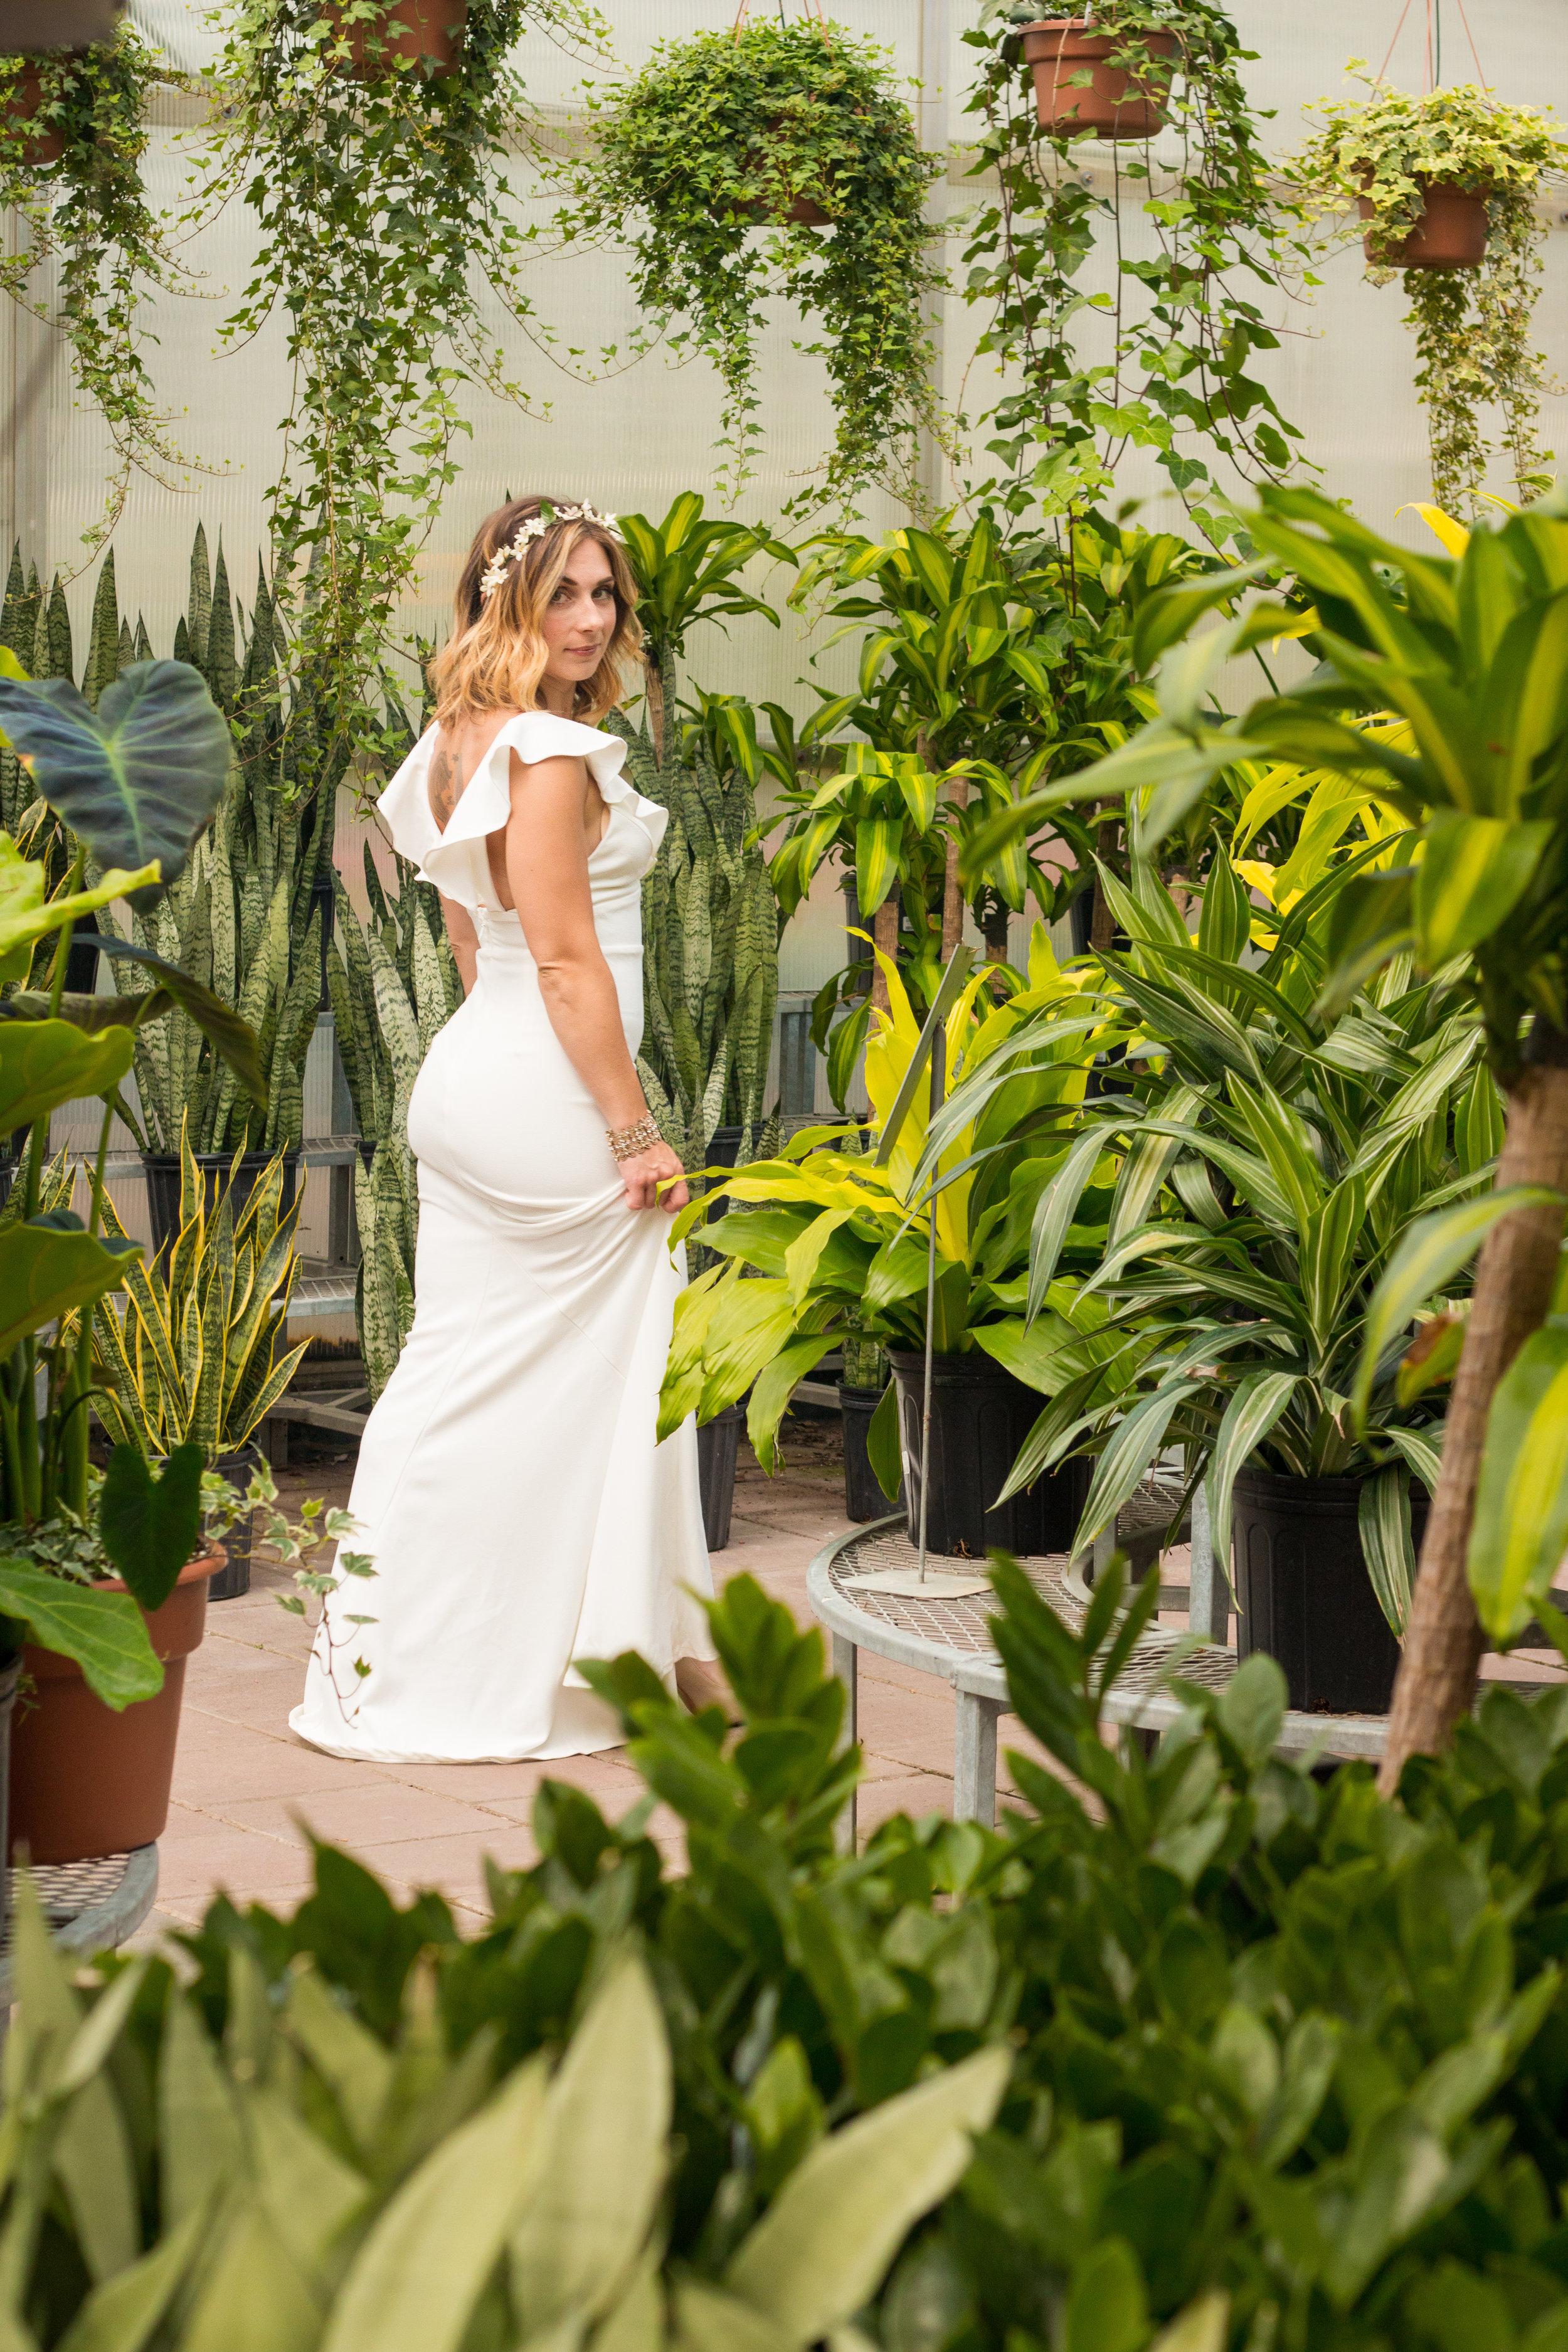 emilysotiphotography-heeman's styled bridal-25.jpg